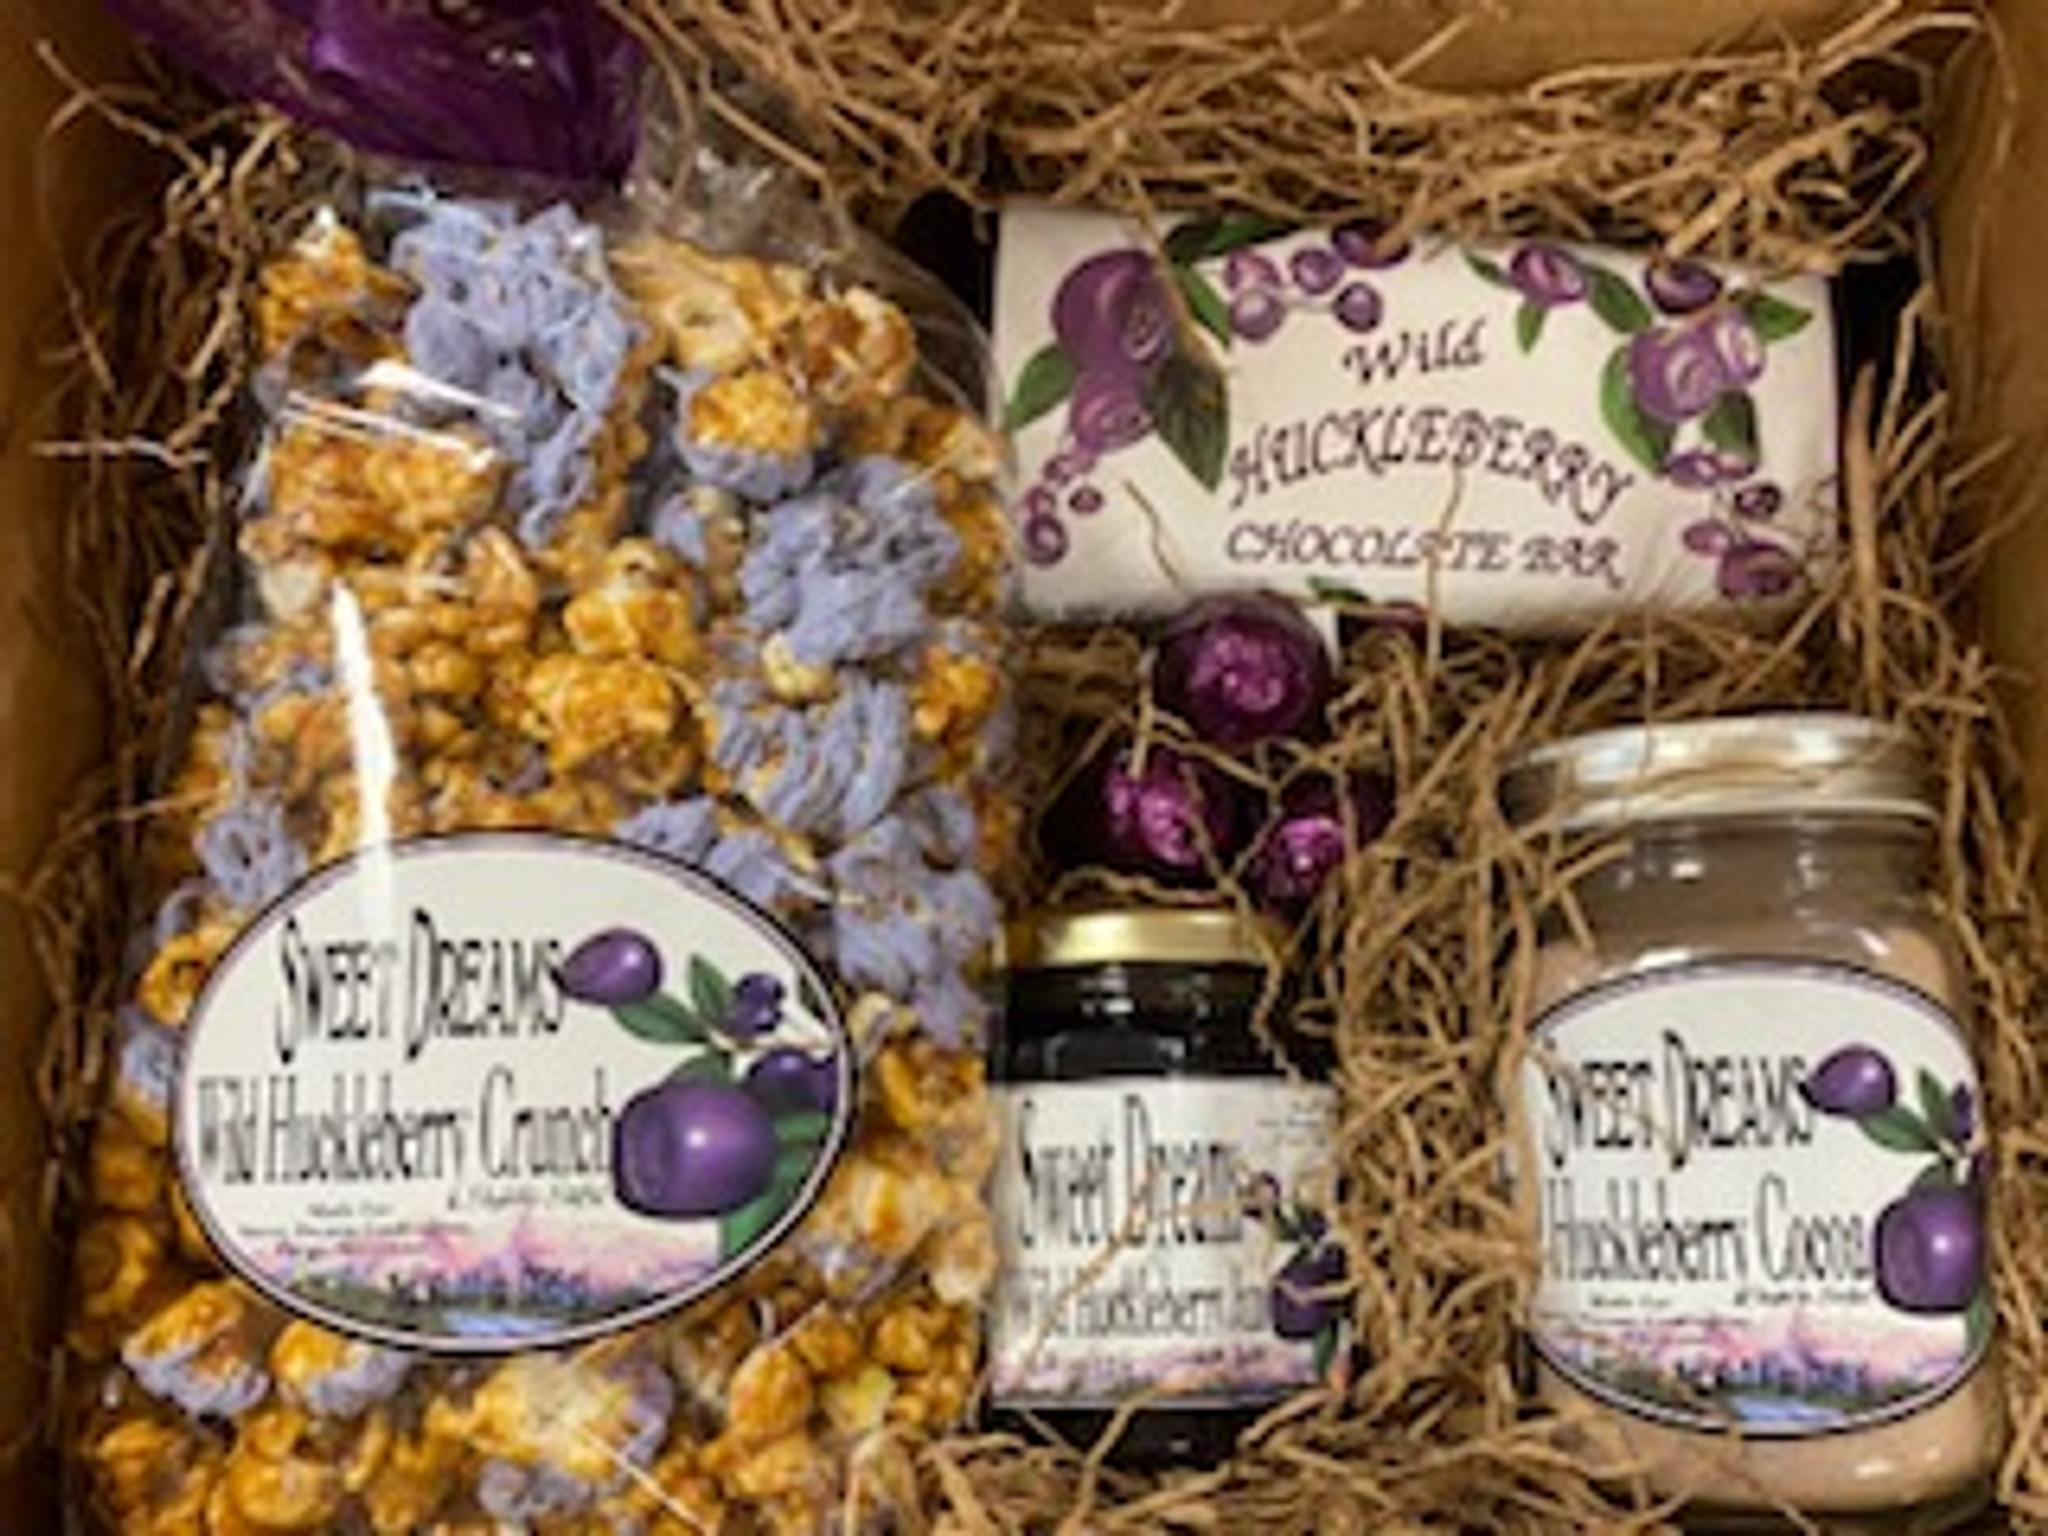 Huckleberry Heaven Gift Box